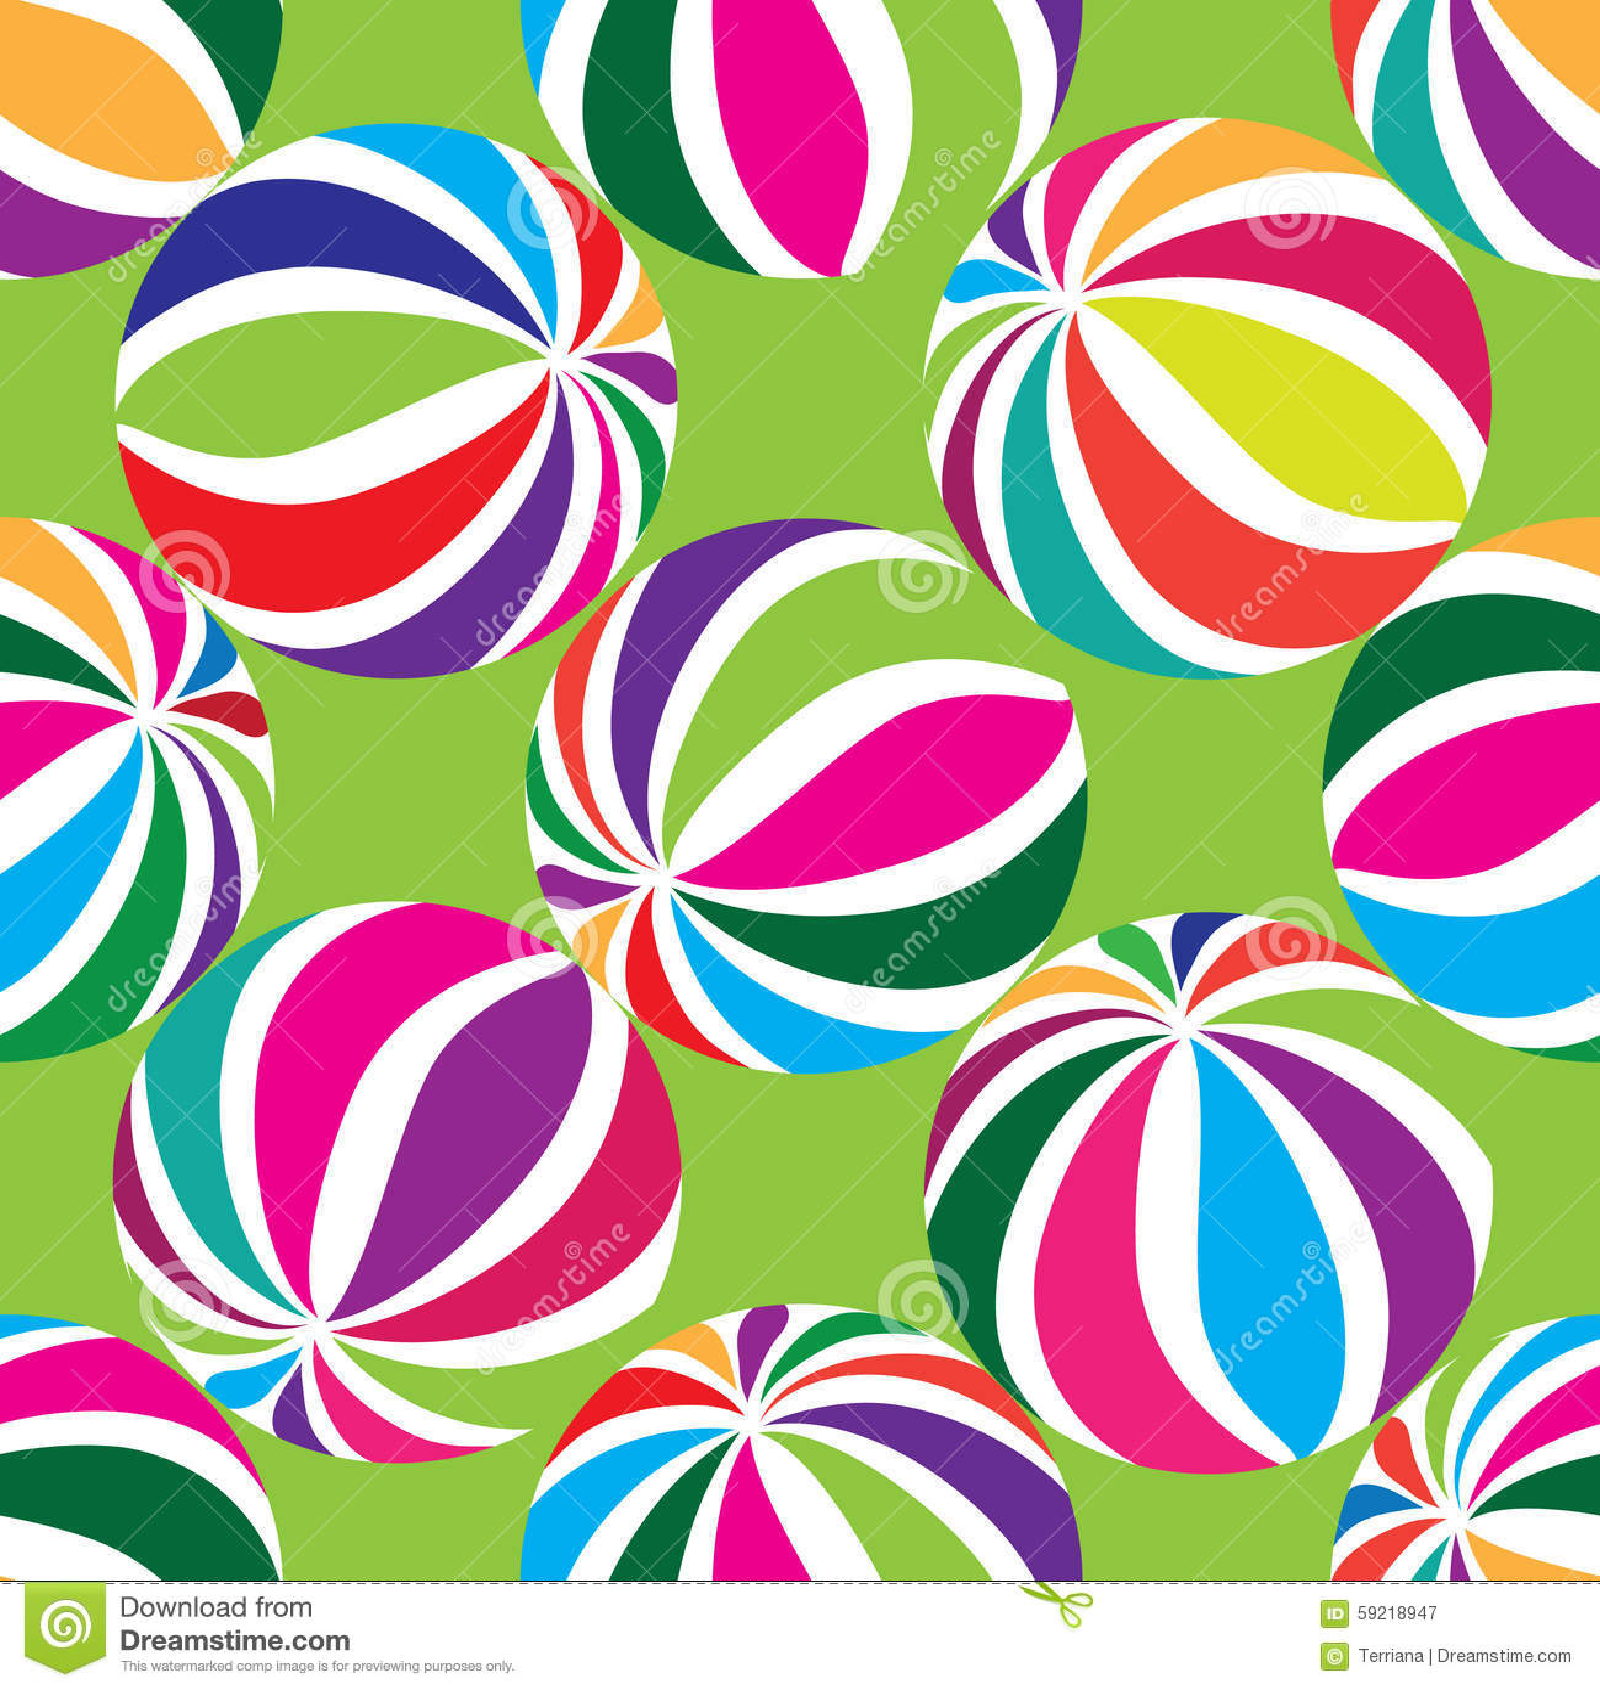 Abstract geometric striped balls seamless pattern.